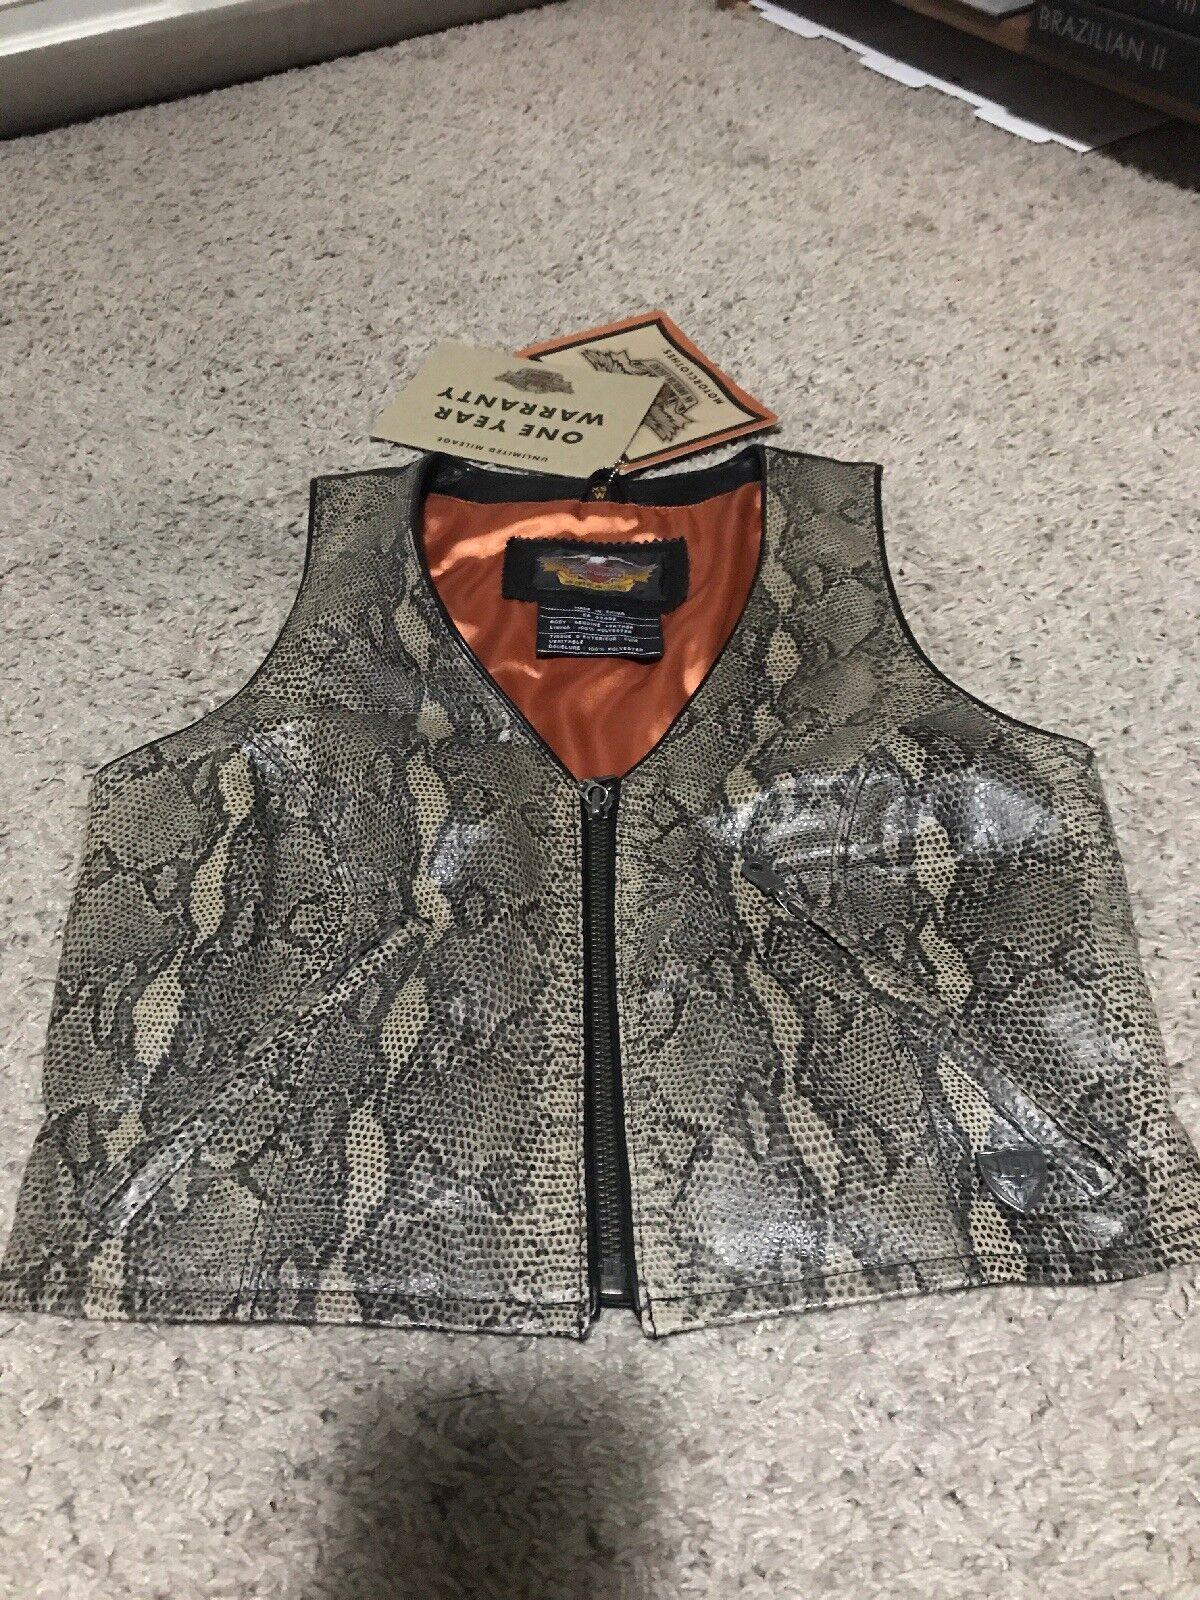 New HARLEY DAVIDSON Motorcycle Women XS Biker Vest 100% Leather Snake Python